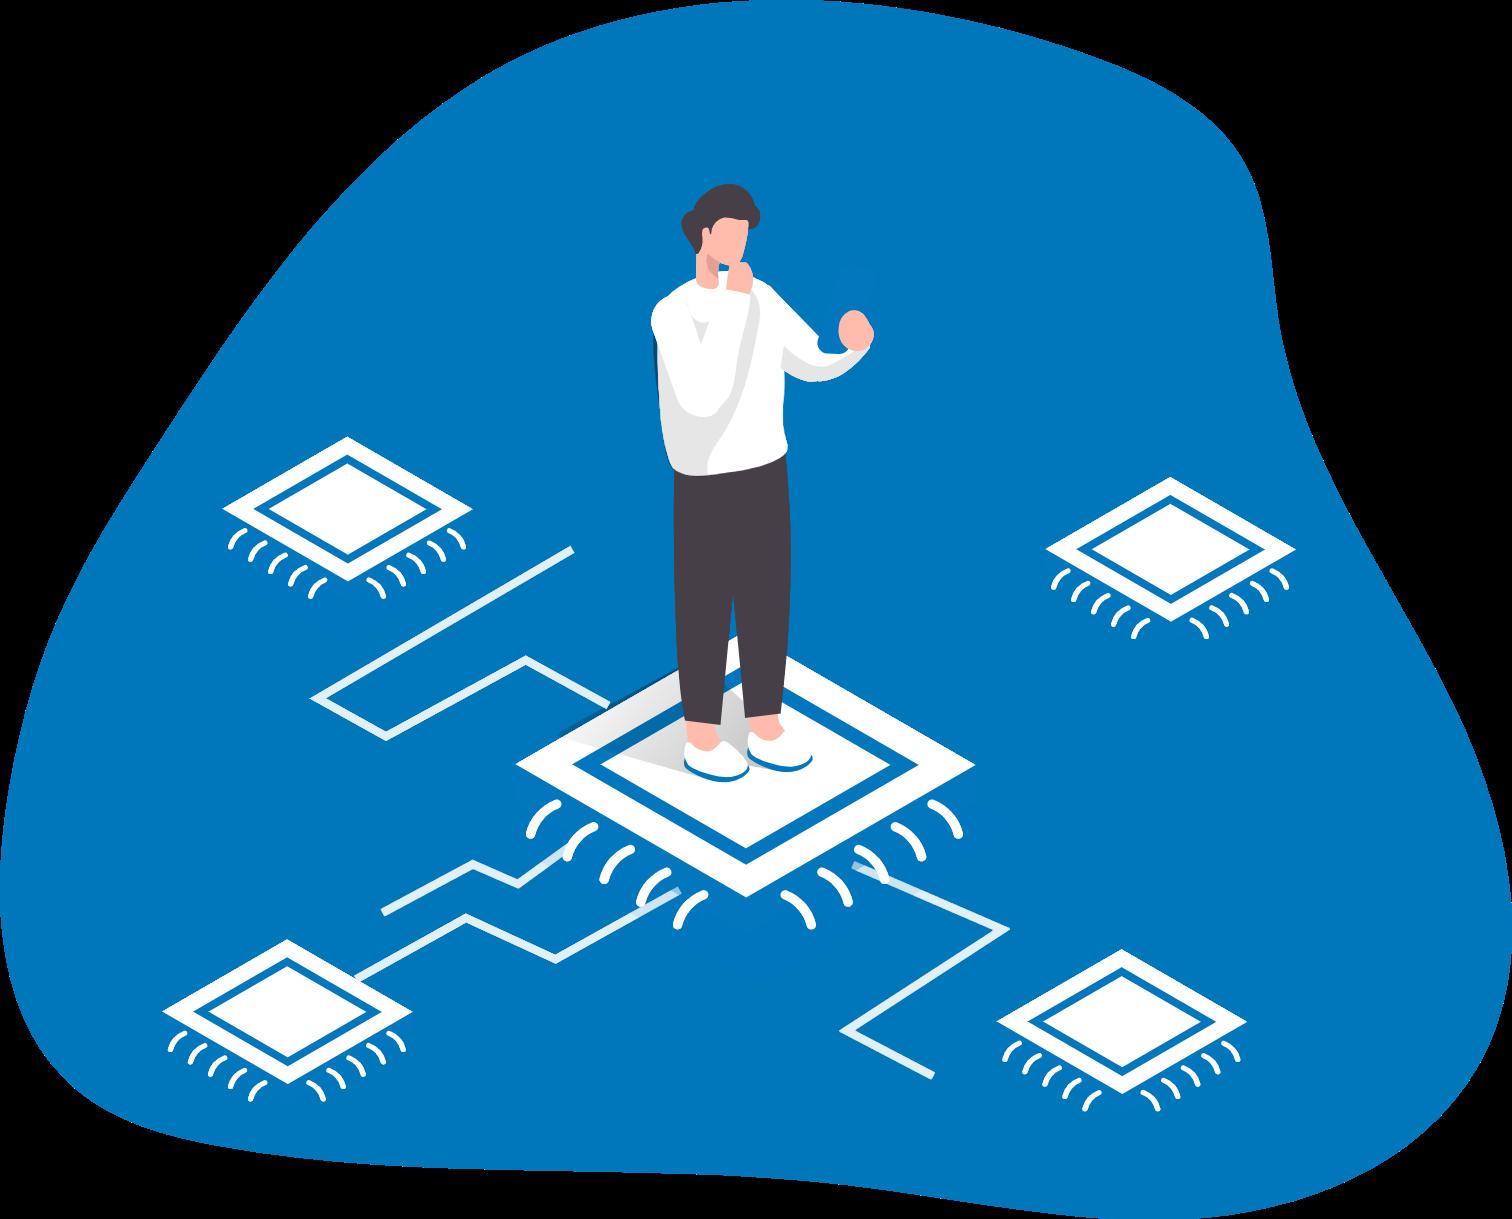 Nephos services - Architecture